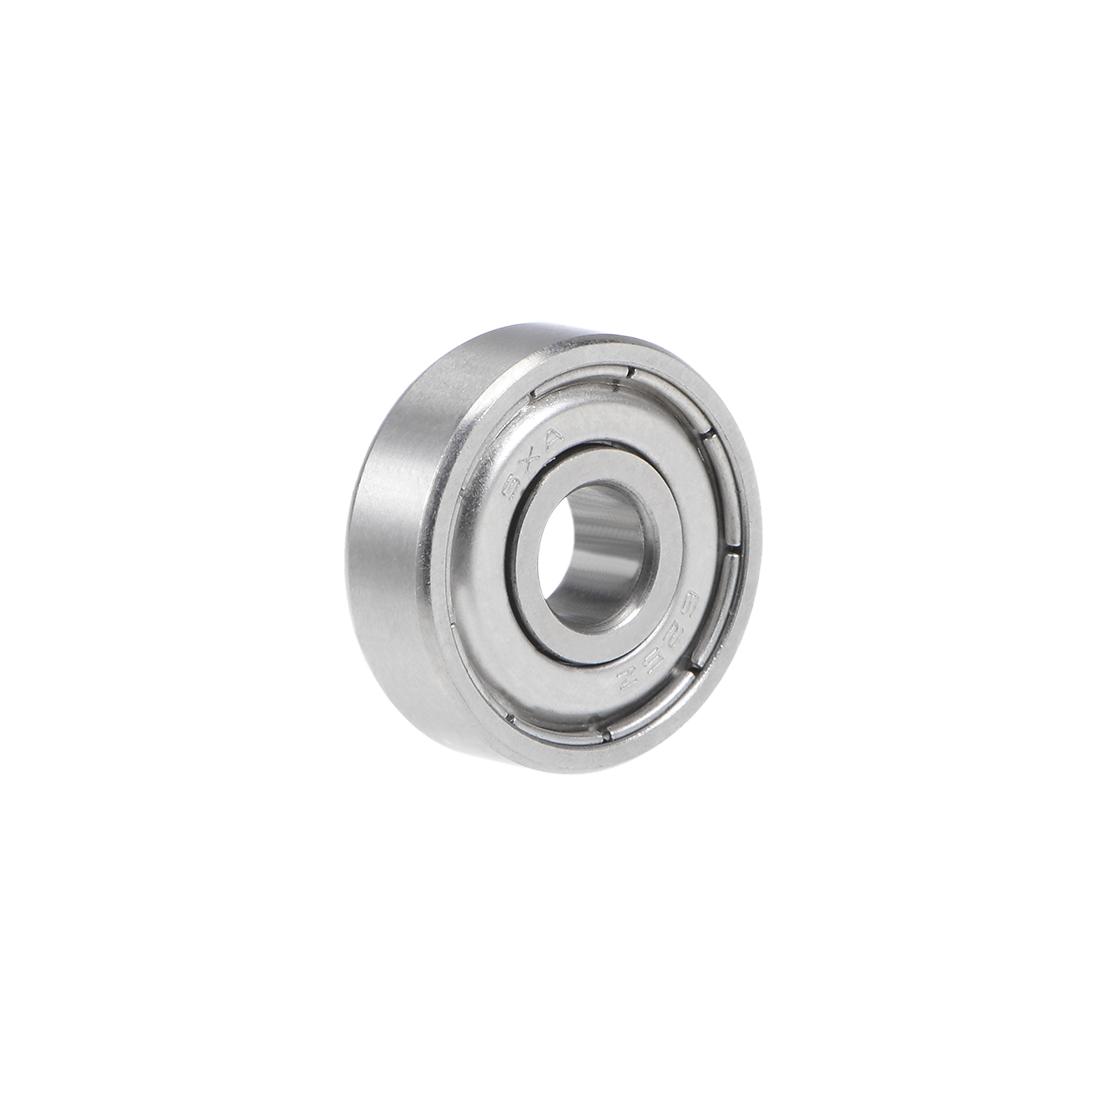 S625ZZ Stainless Steel Ball Bearing 5x16x5mm Double Shielded 625Z Bearings